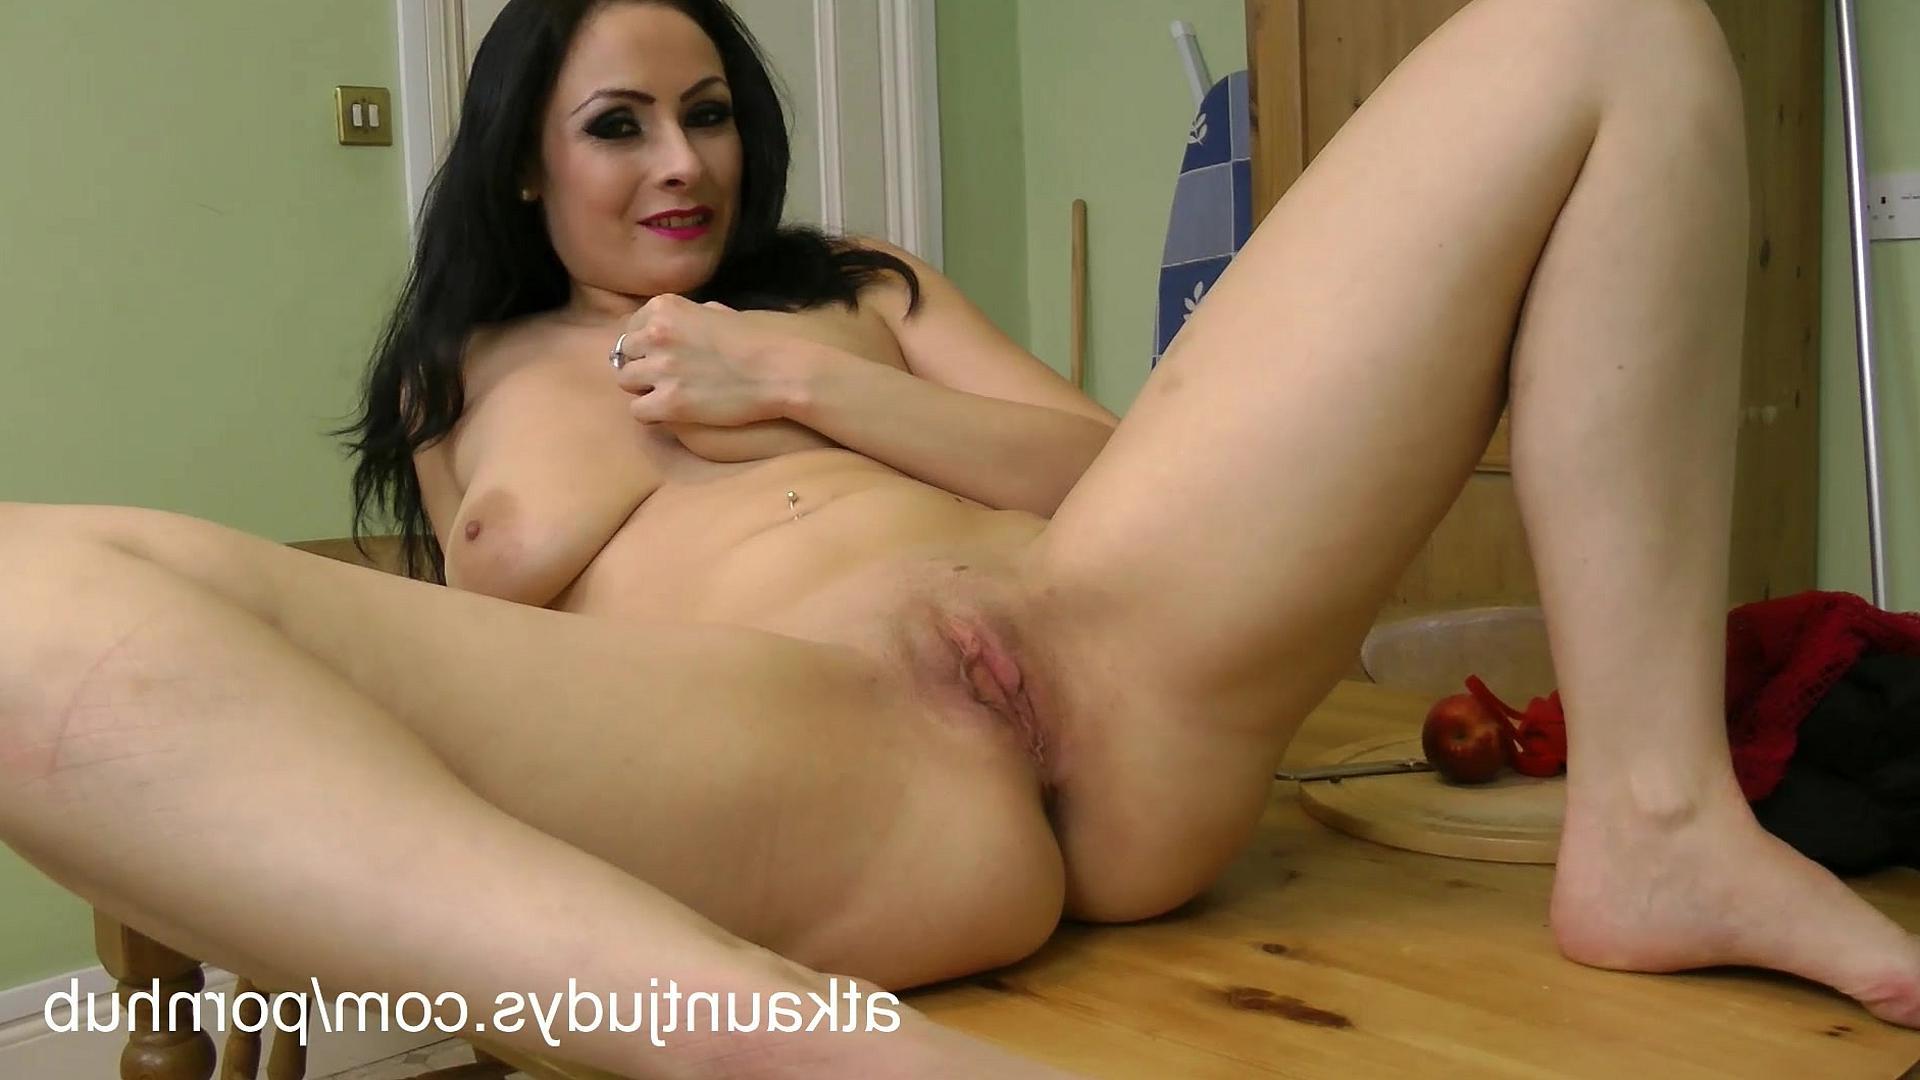 Секс видио крупные зрелые мамочки фото 561-37